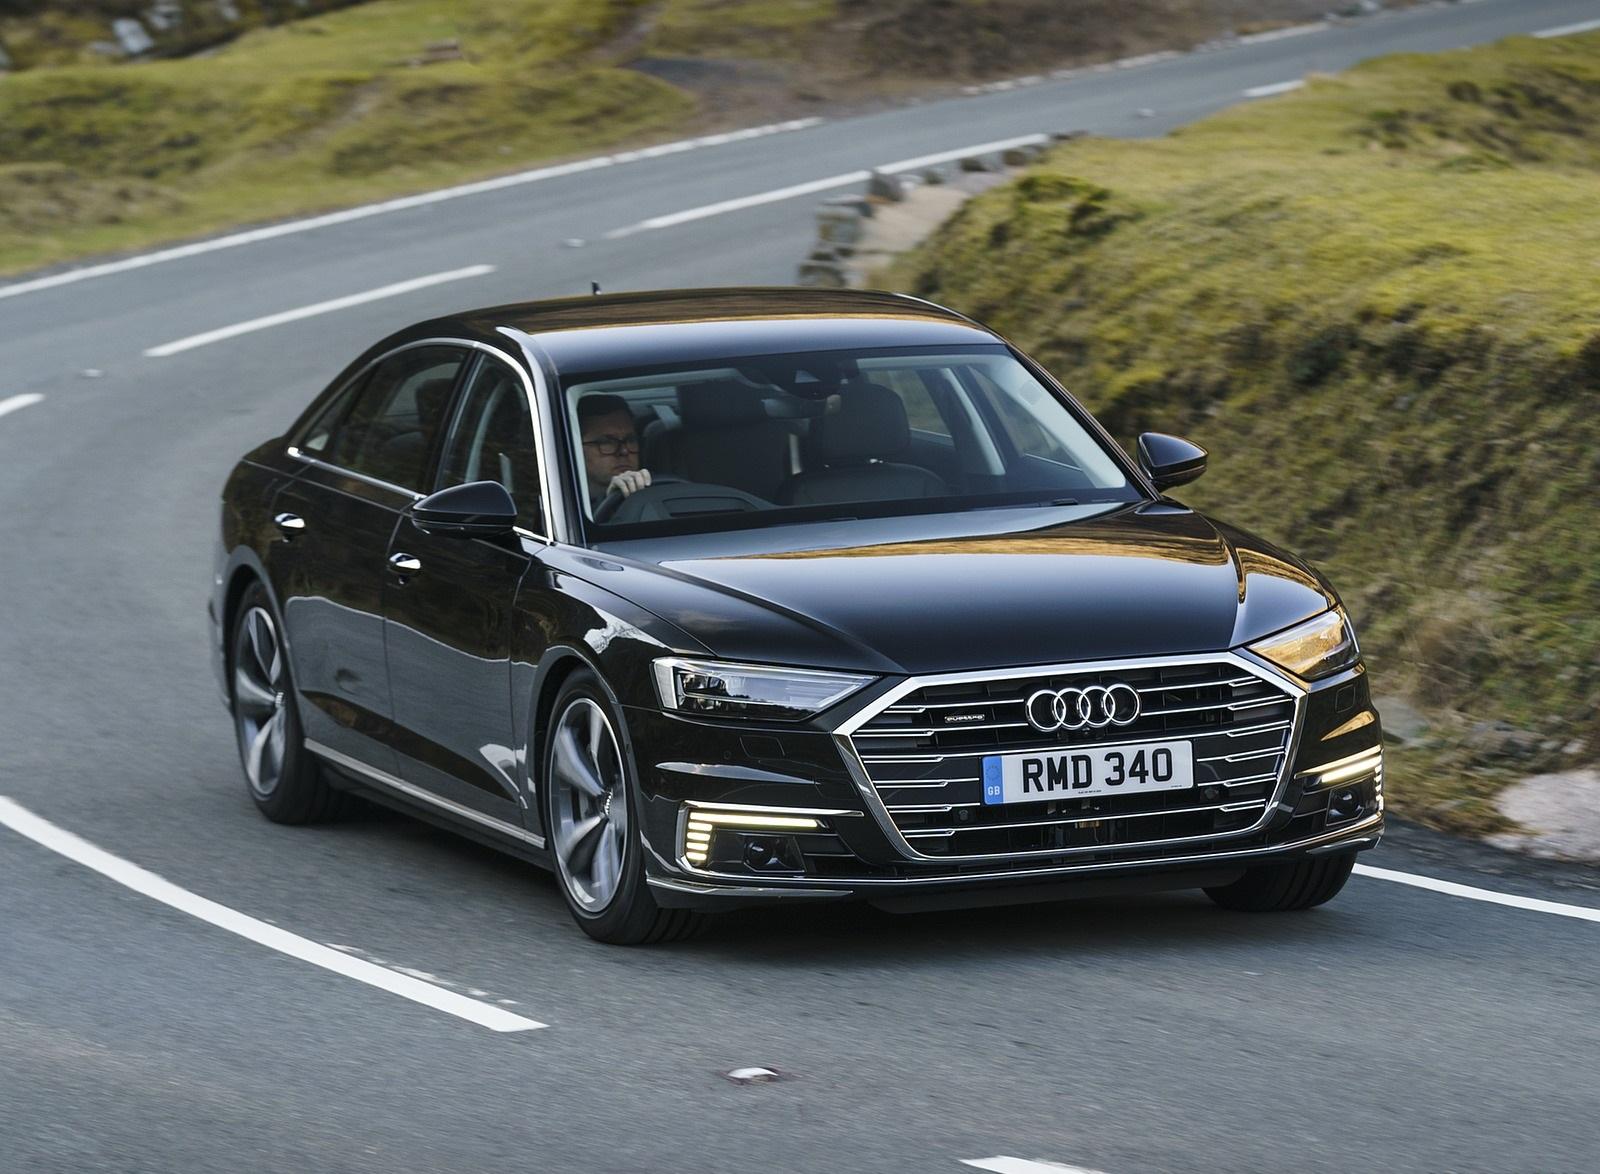 2020 Audi A8 L 60 TFSI e quattro (Plug-In Hybrid UK-Spec) Front Three-Quarter Wallpapers (7)